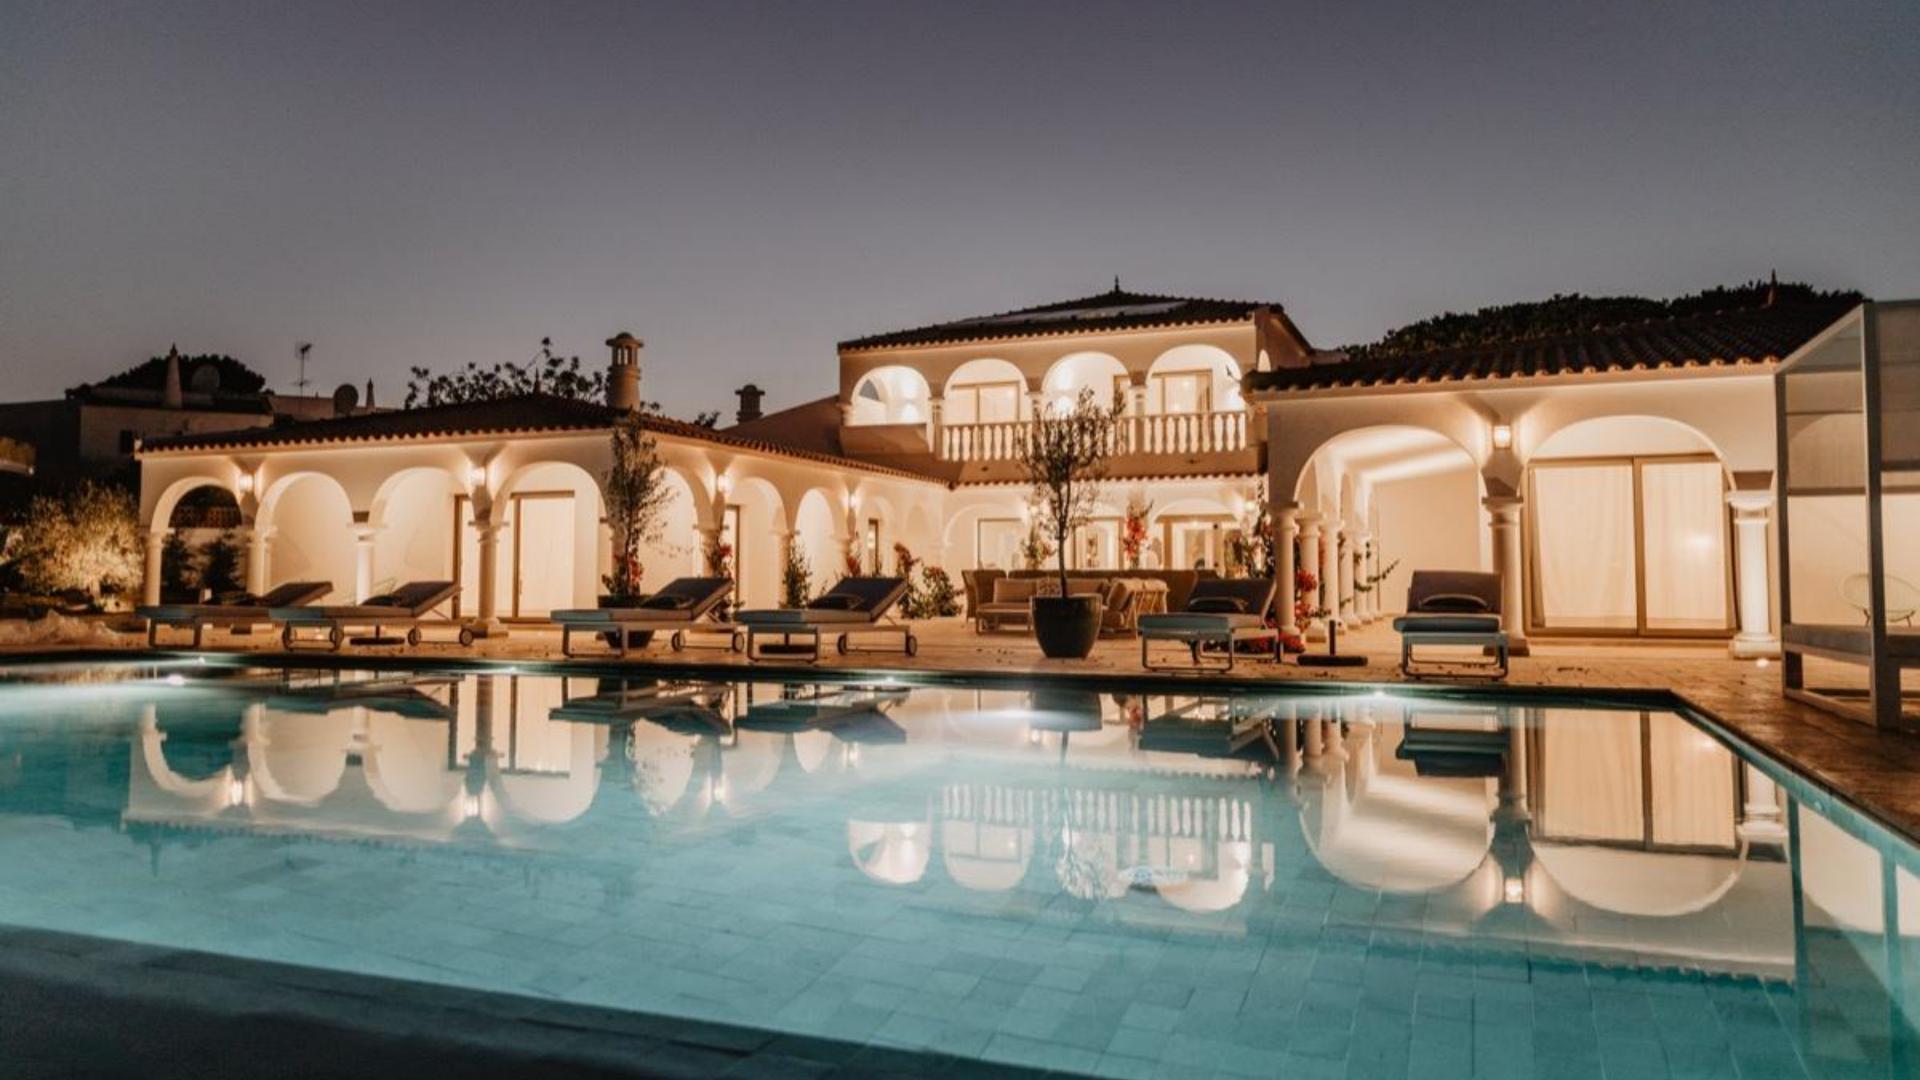 Villa Granvila - Cavalo Preto, Quarteira, Algarve - Villa_Granvila_Exterior_2_1.png